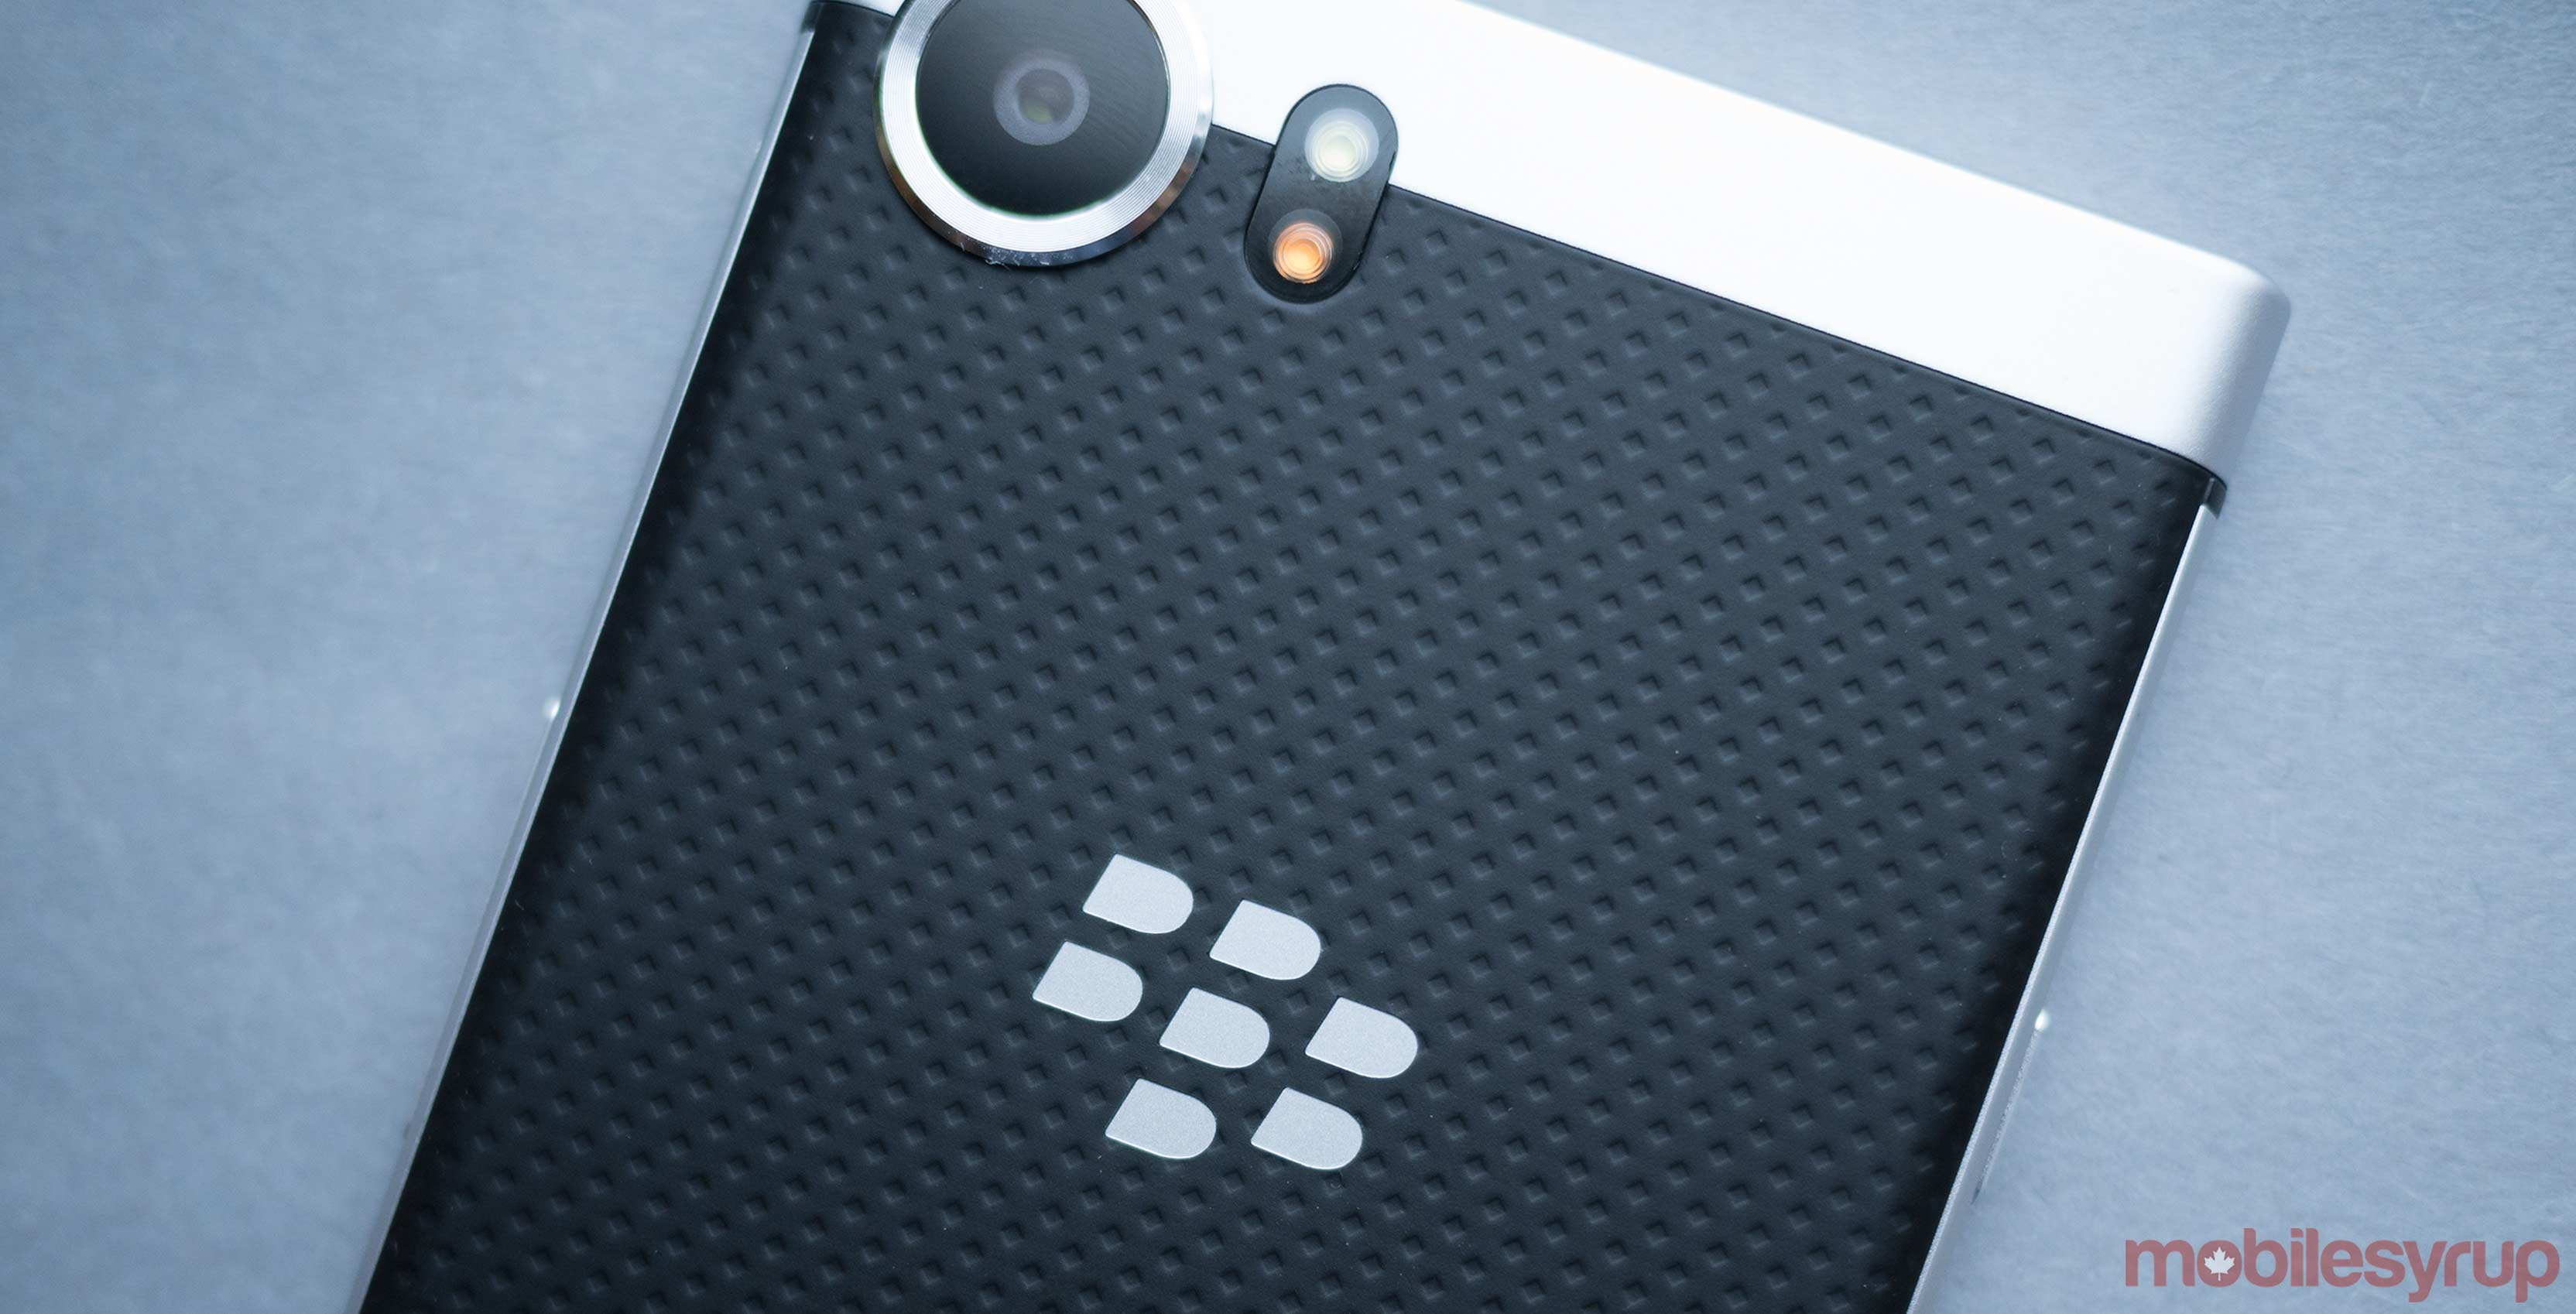 BlackBerry log on device